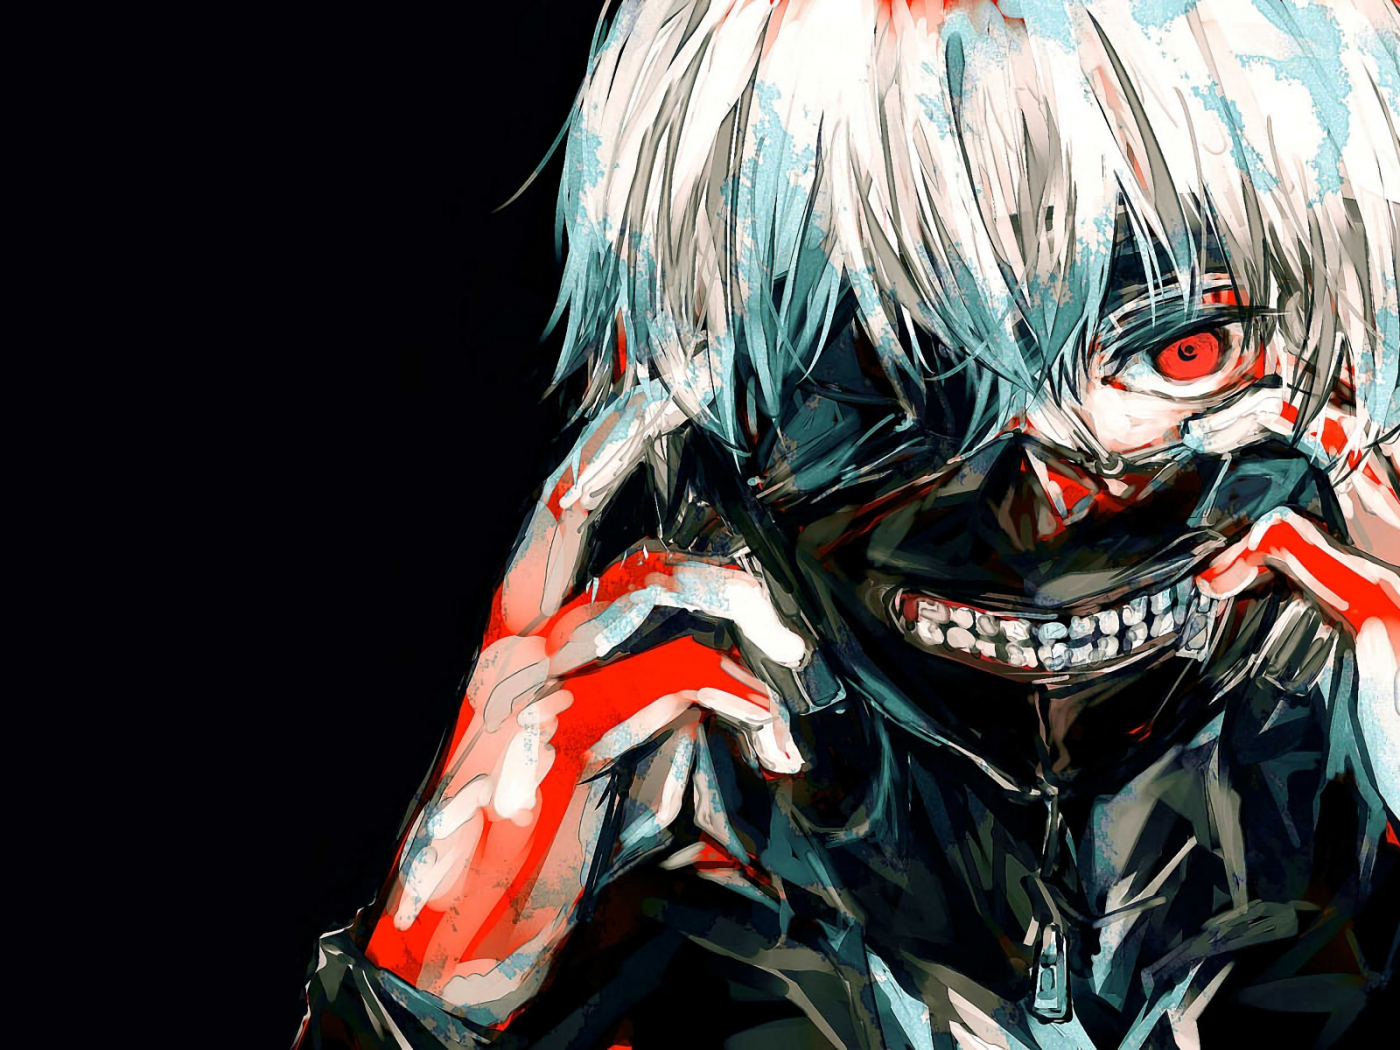 Desktop Wallpaper Ken Kaneki Dark Anime Boy Hd Image Picture Background Z Ddw6